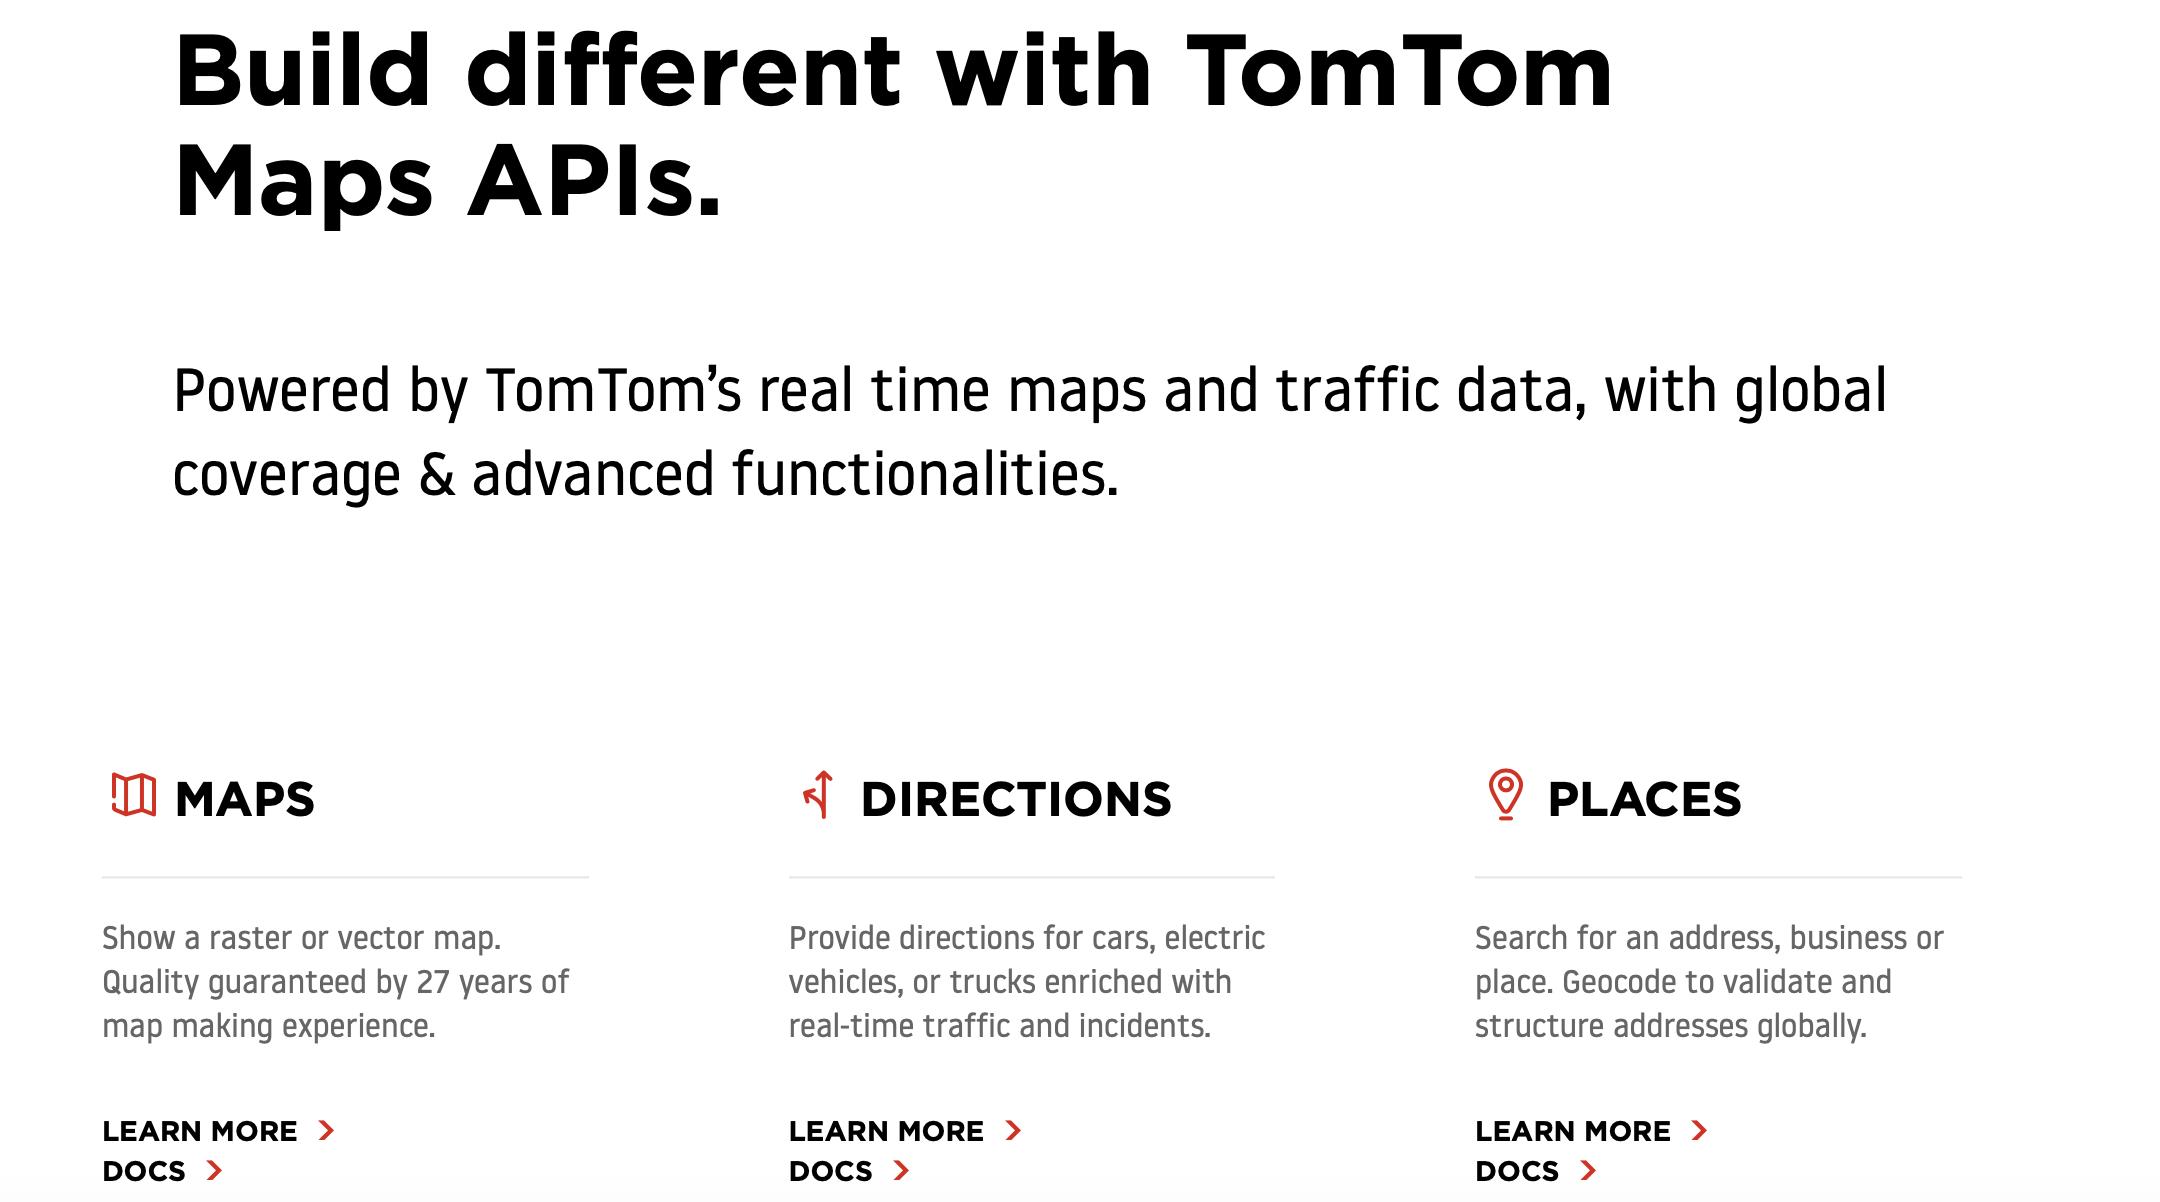 TomTom Maps API